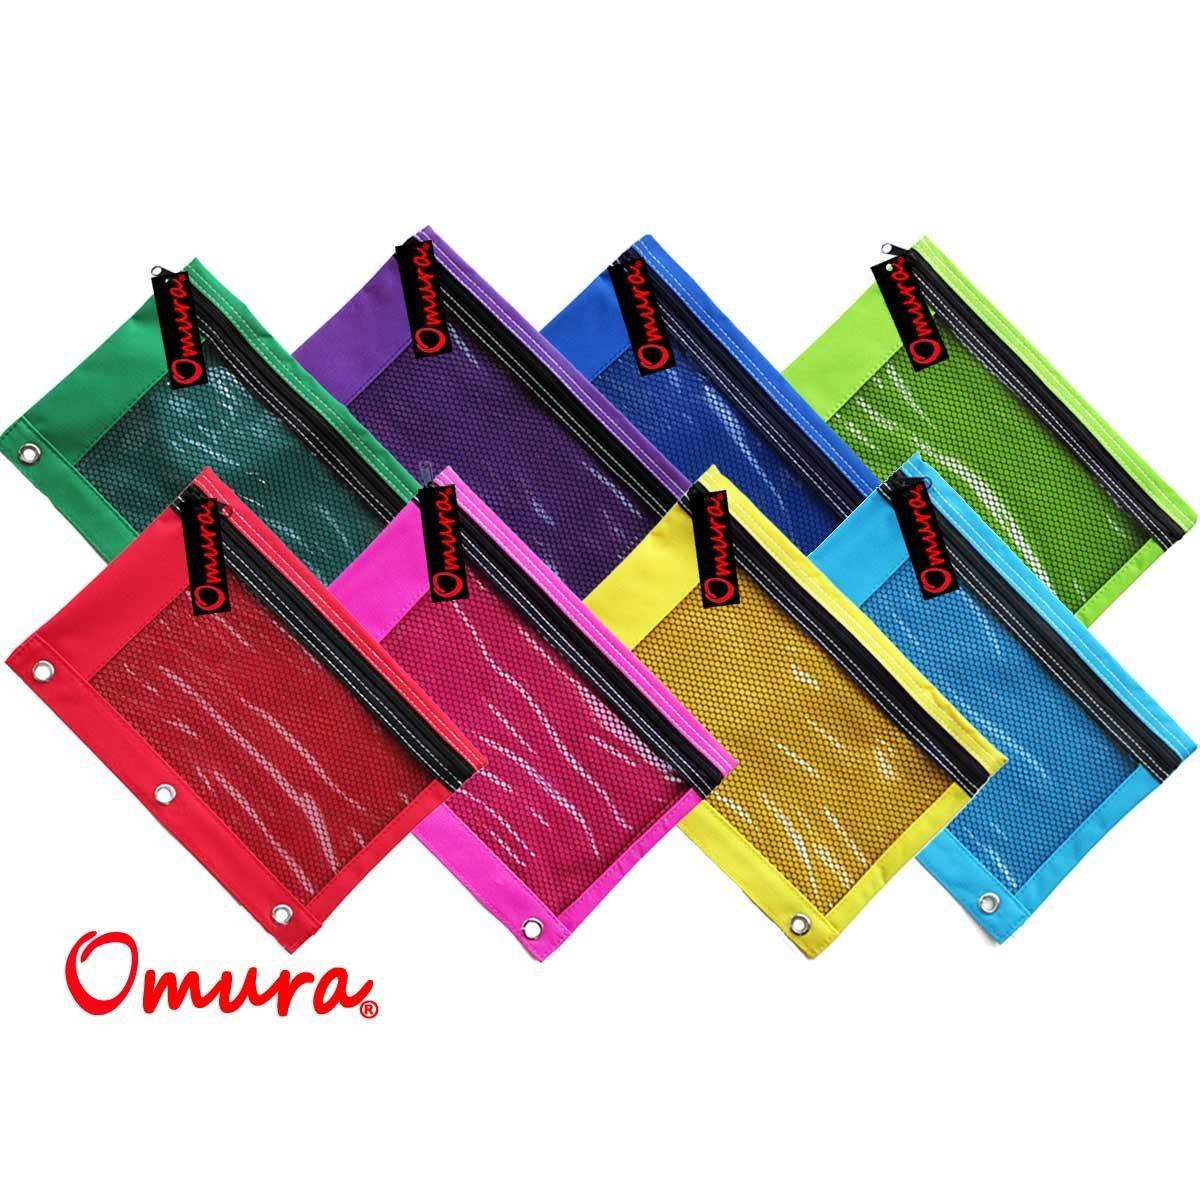 Omura Pencil Pouch, Mesh Windows, Zippered & Standard 3-Ring Binder ULTRA BRITE, Pack of 8 (OM-8034-ULTRA)